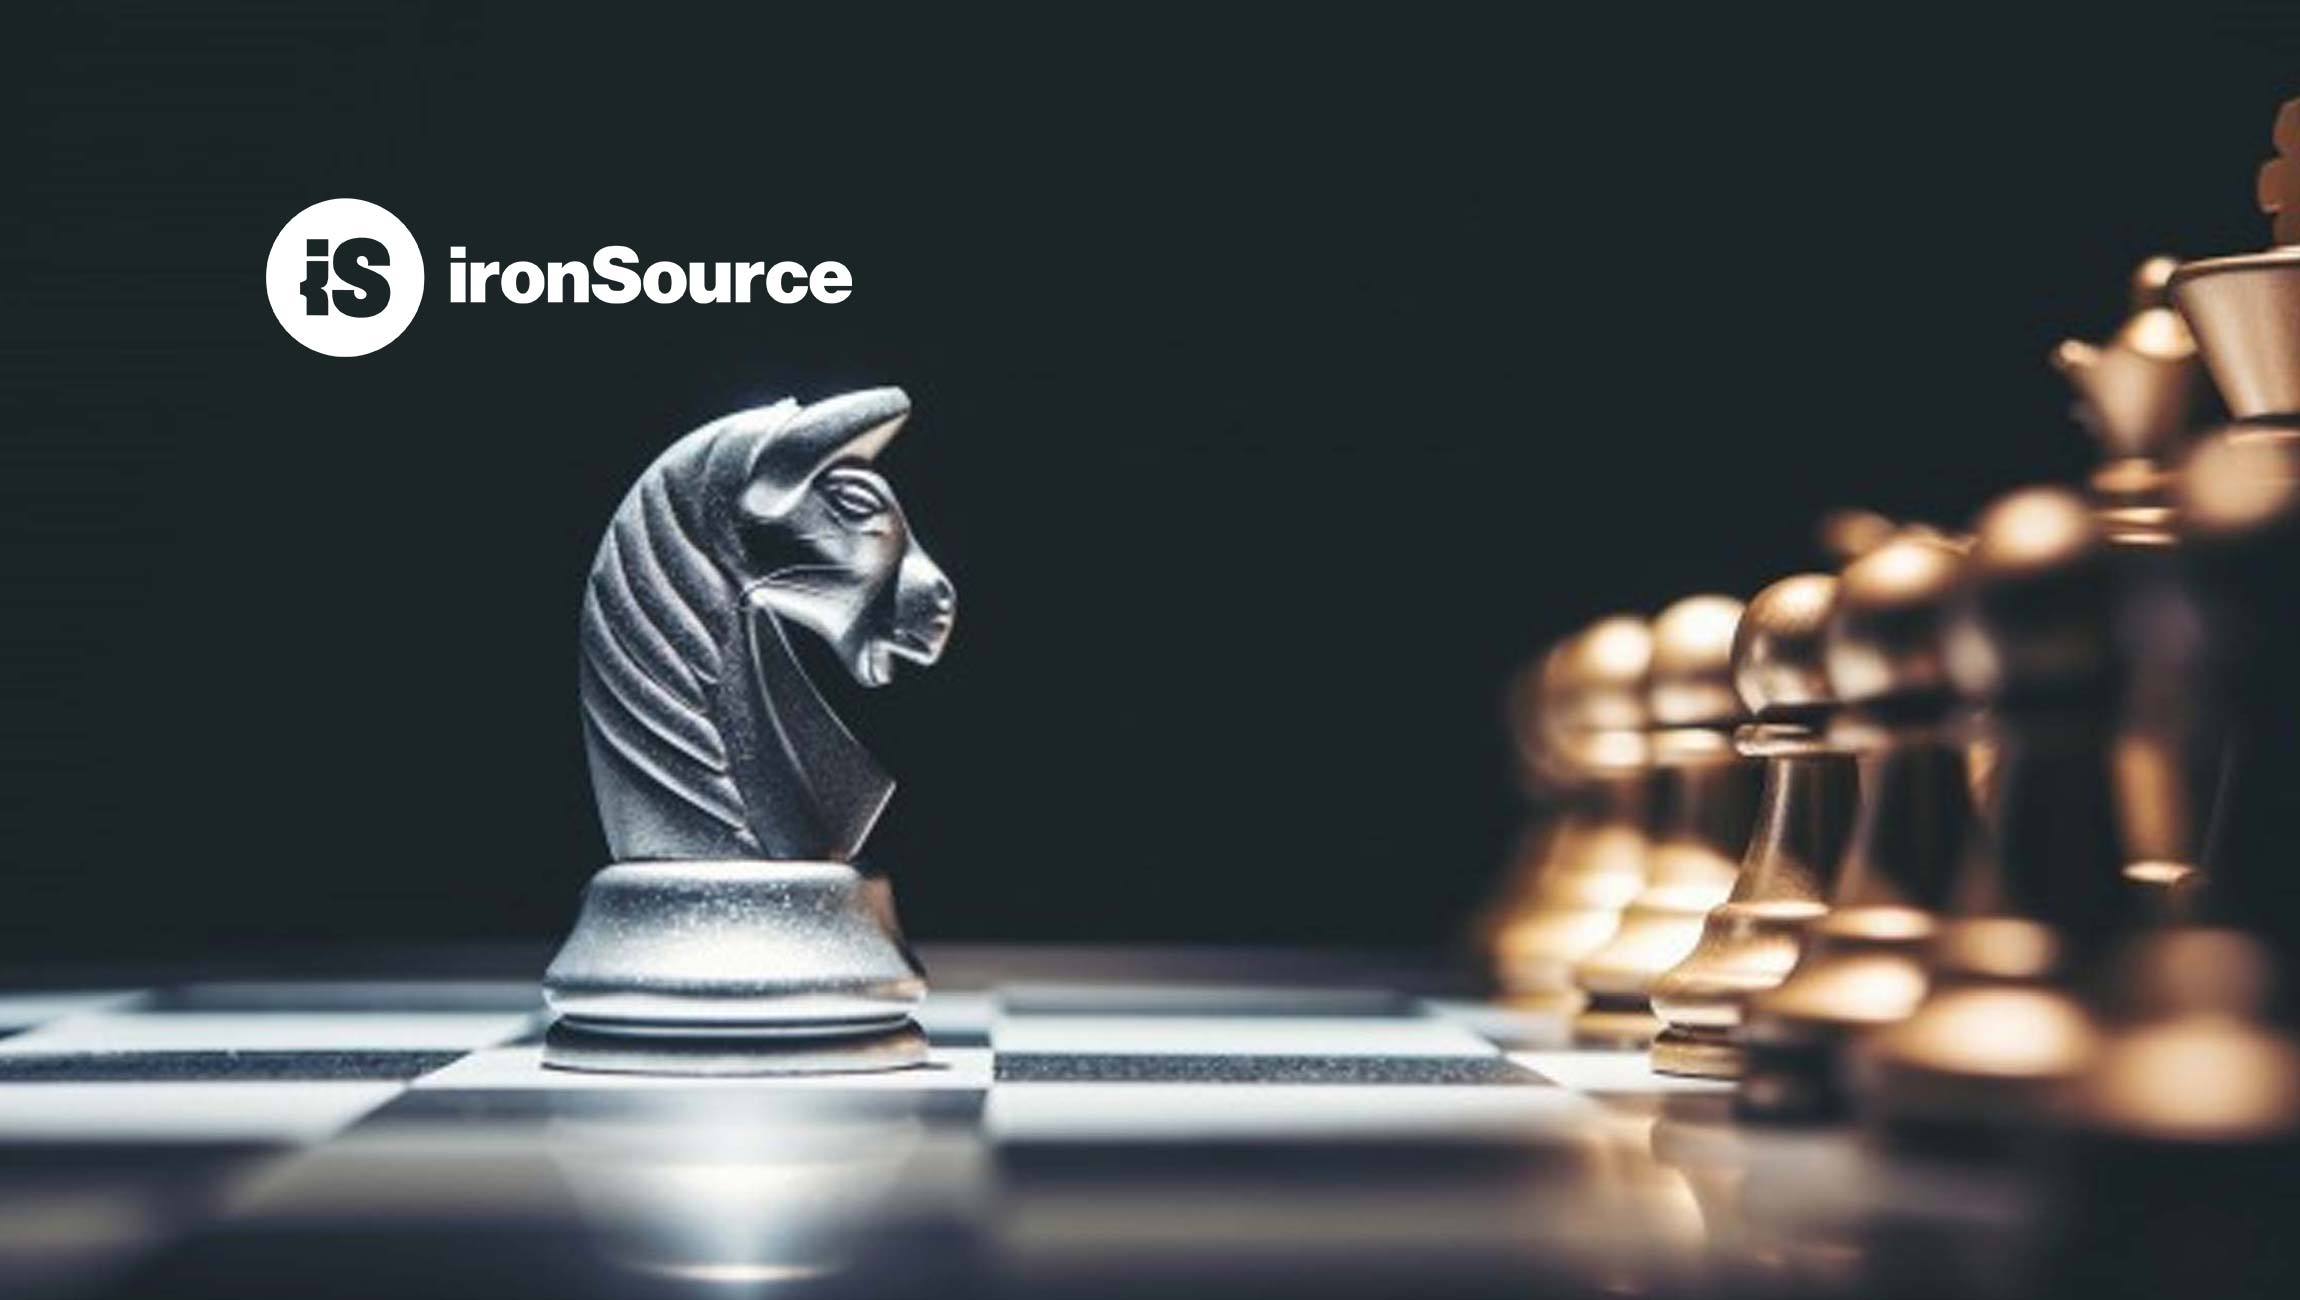 ironSource Aura Announces Partnership with Orange France